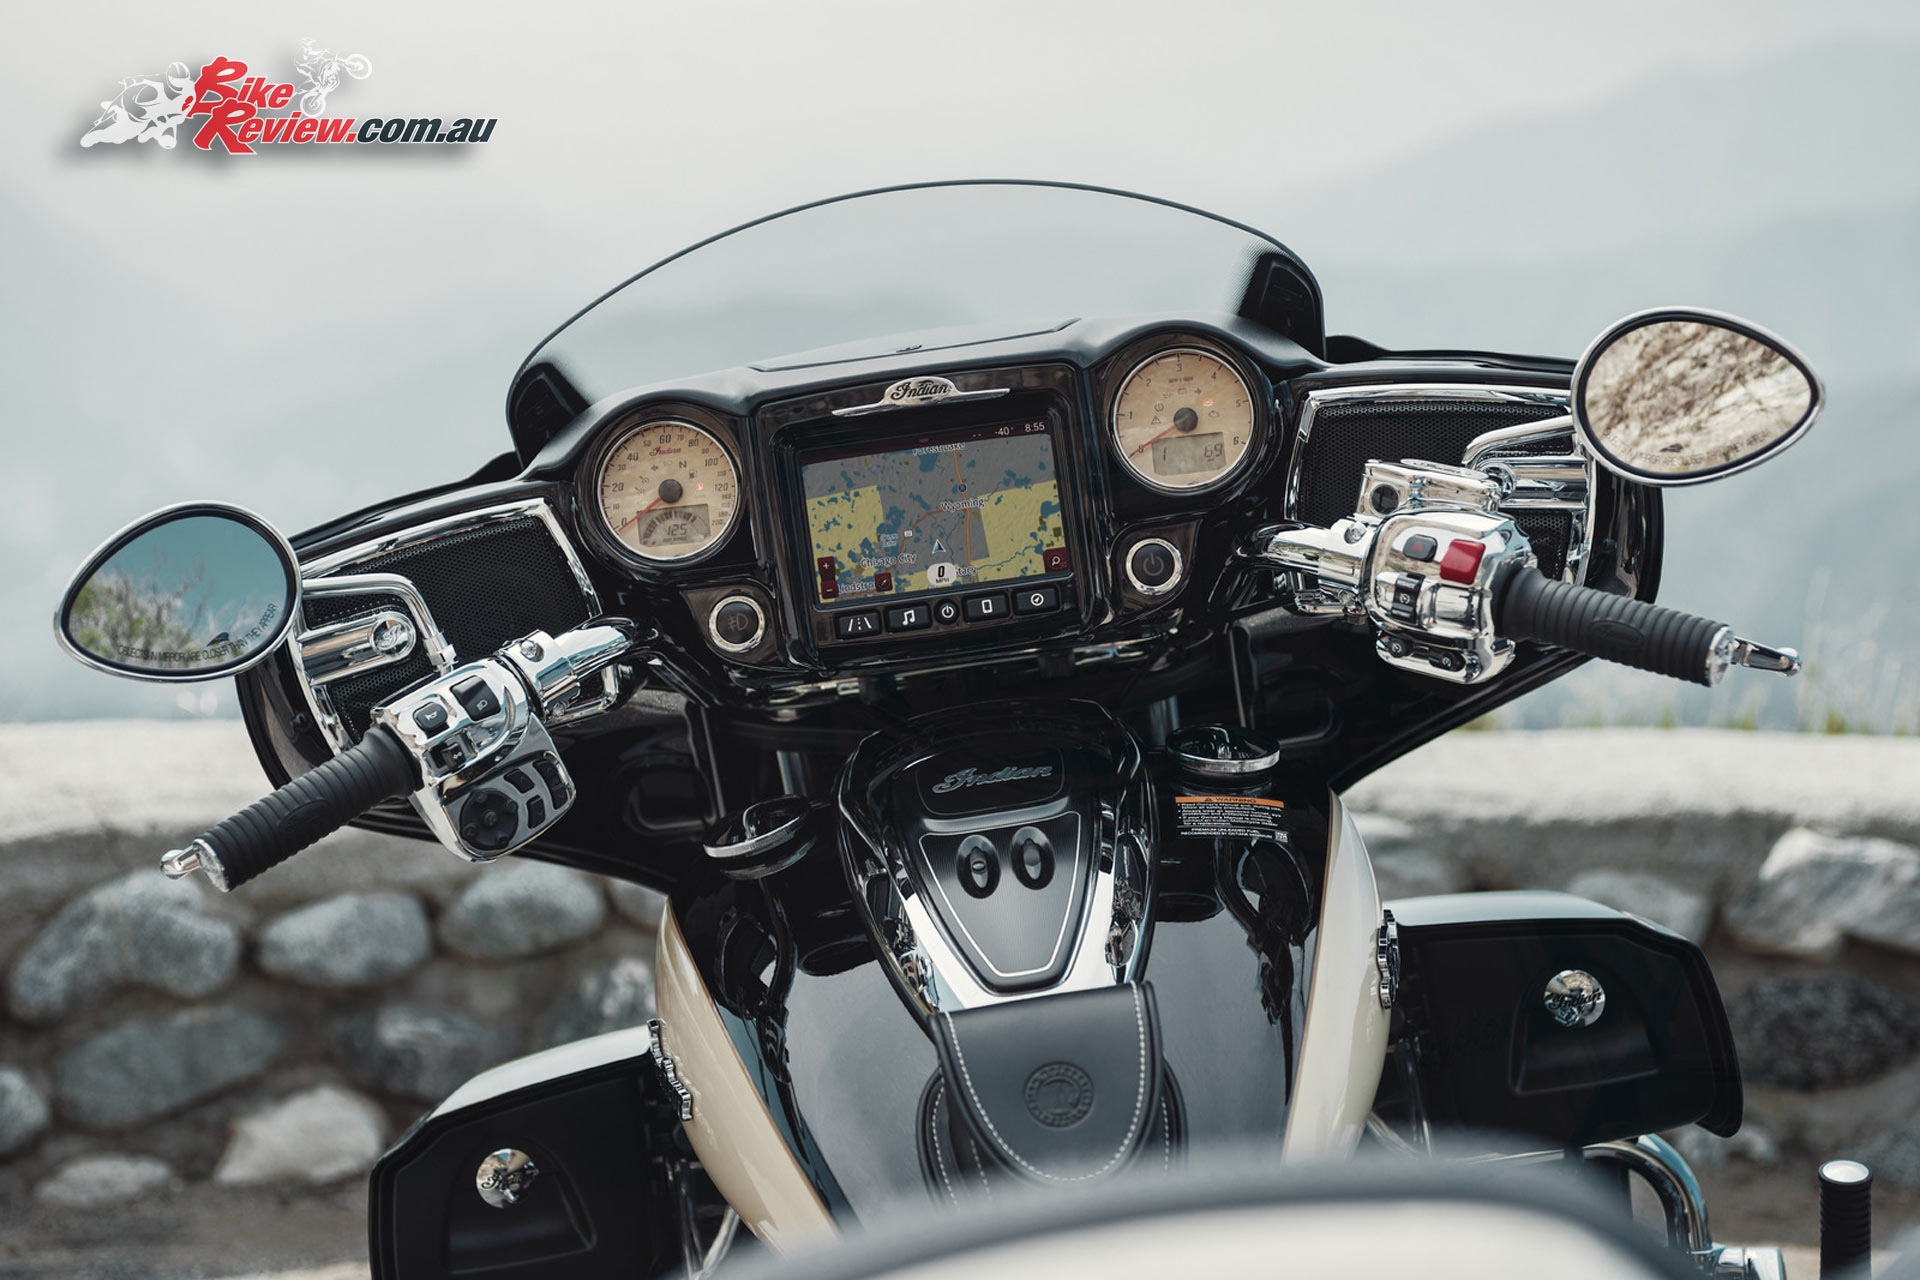 2017 Indian Roadmaster